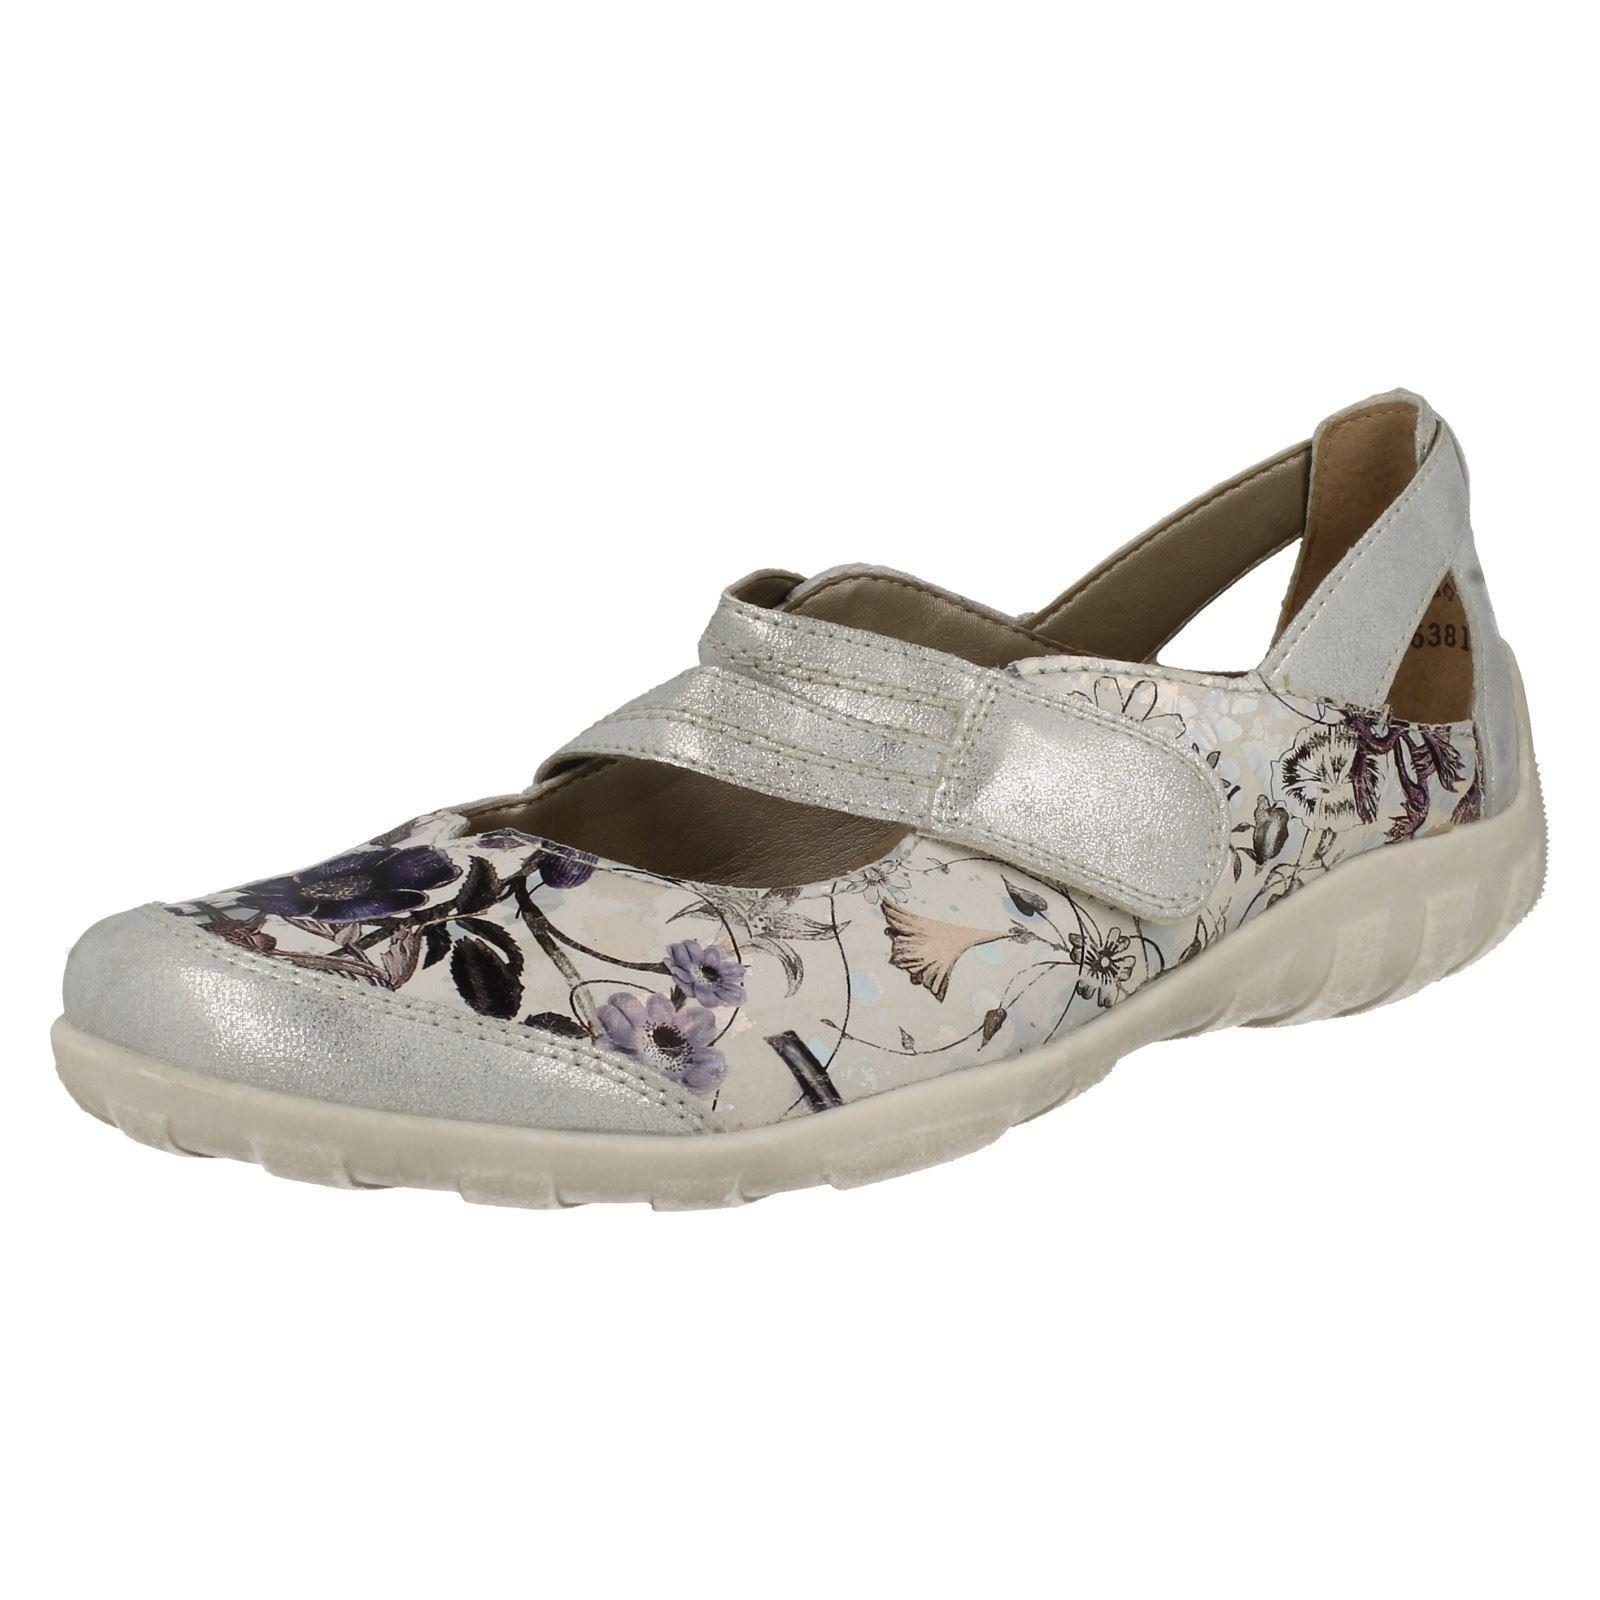 REMONTE Remonte Ladies Shoe R3427 Multi 39 81pAzl1v